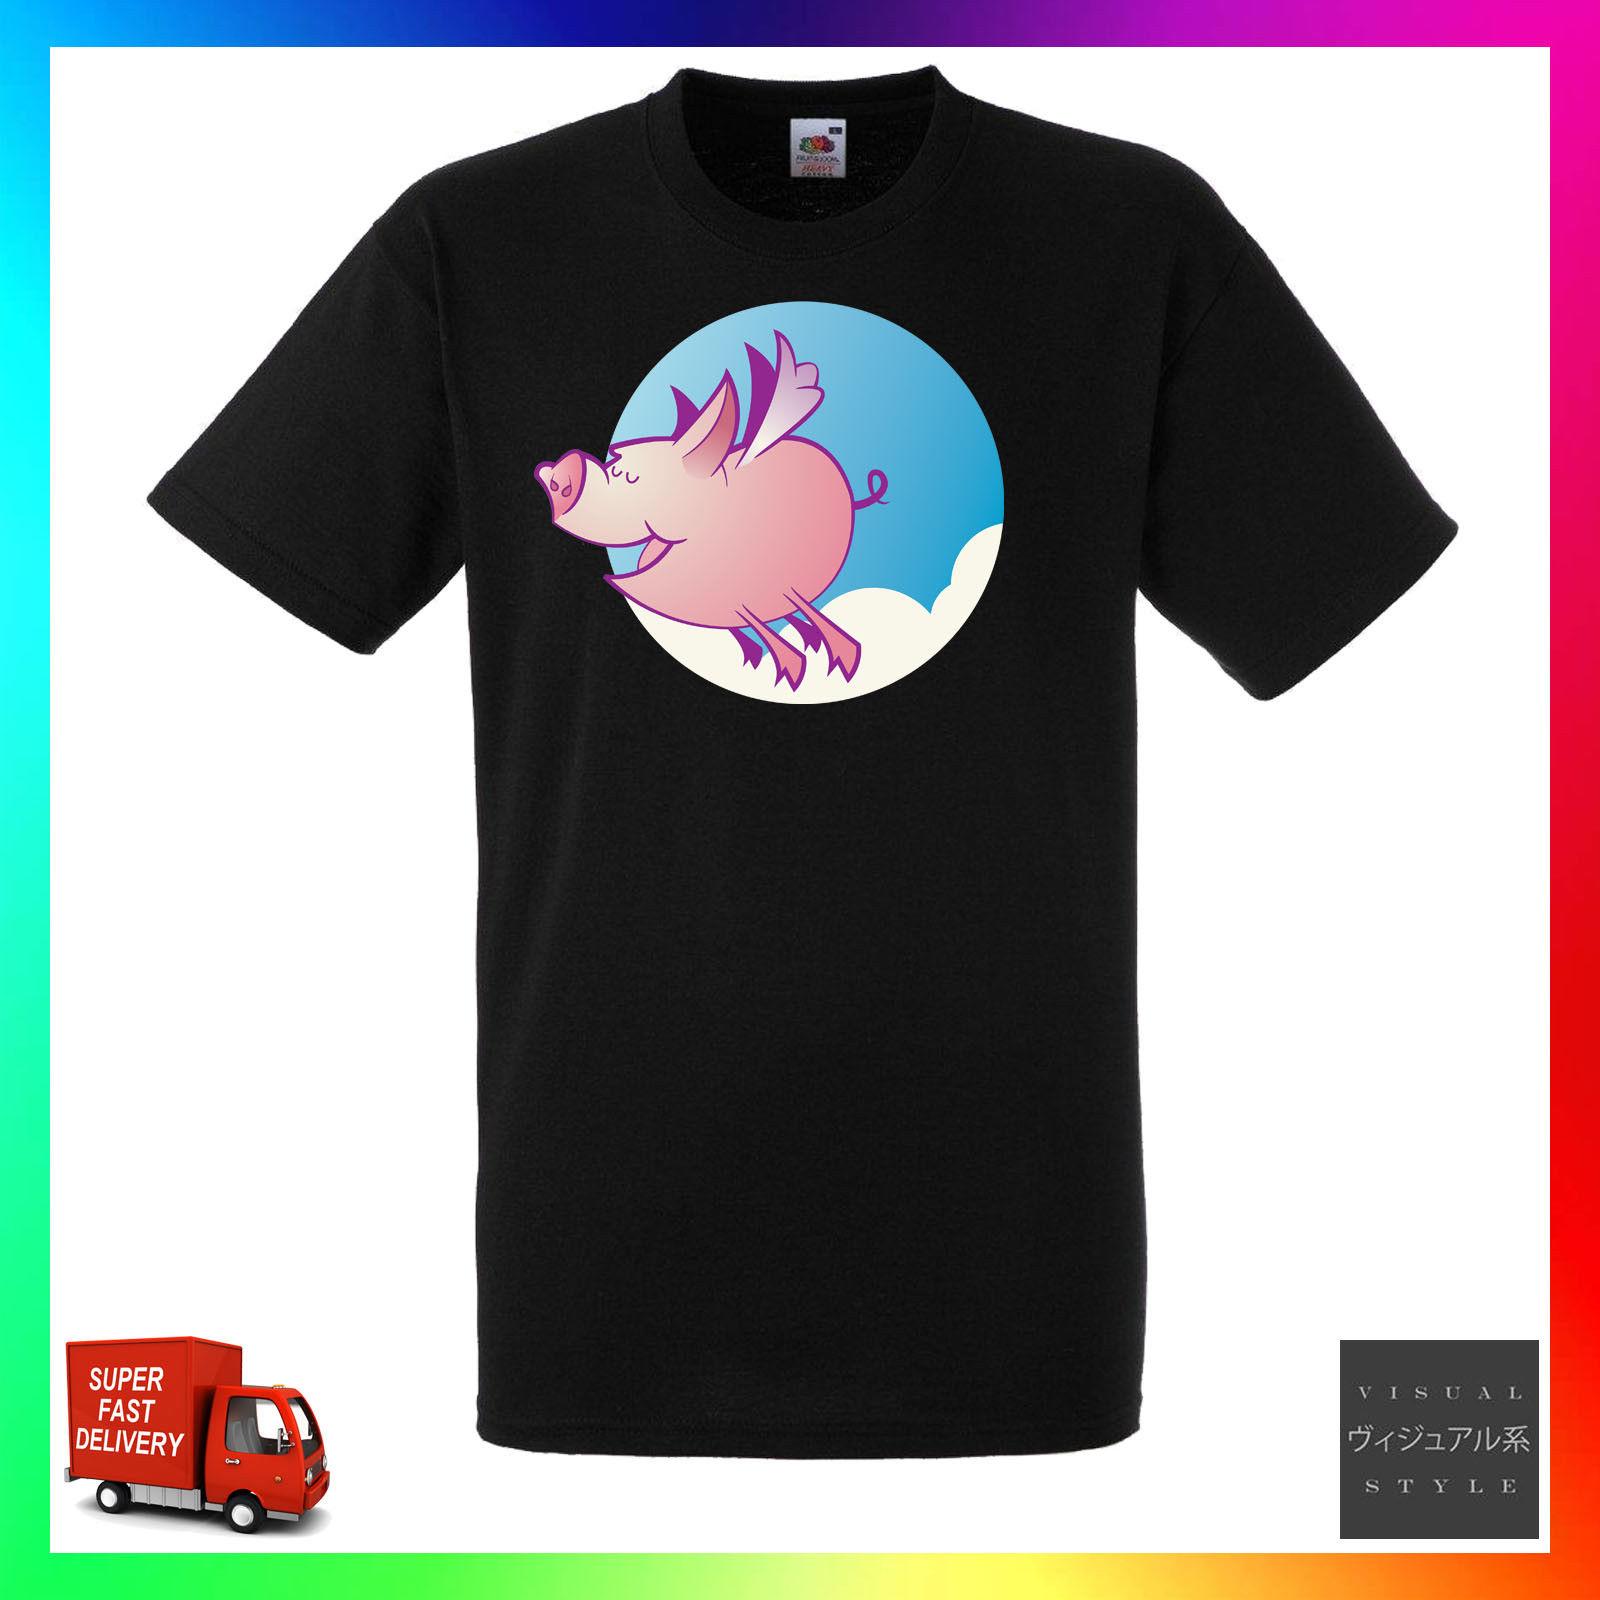 Pigs Will Fly camiseta Unisex lindo Flying May cita diciendo divertido CoolCool Casual pride camiseta hombres moda Unisex